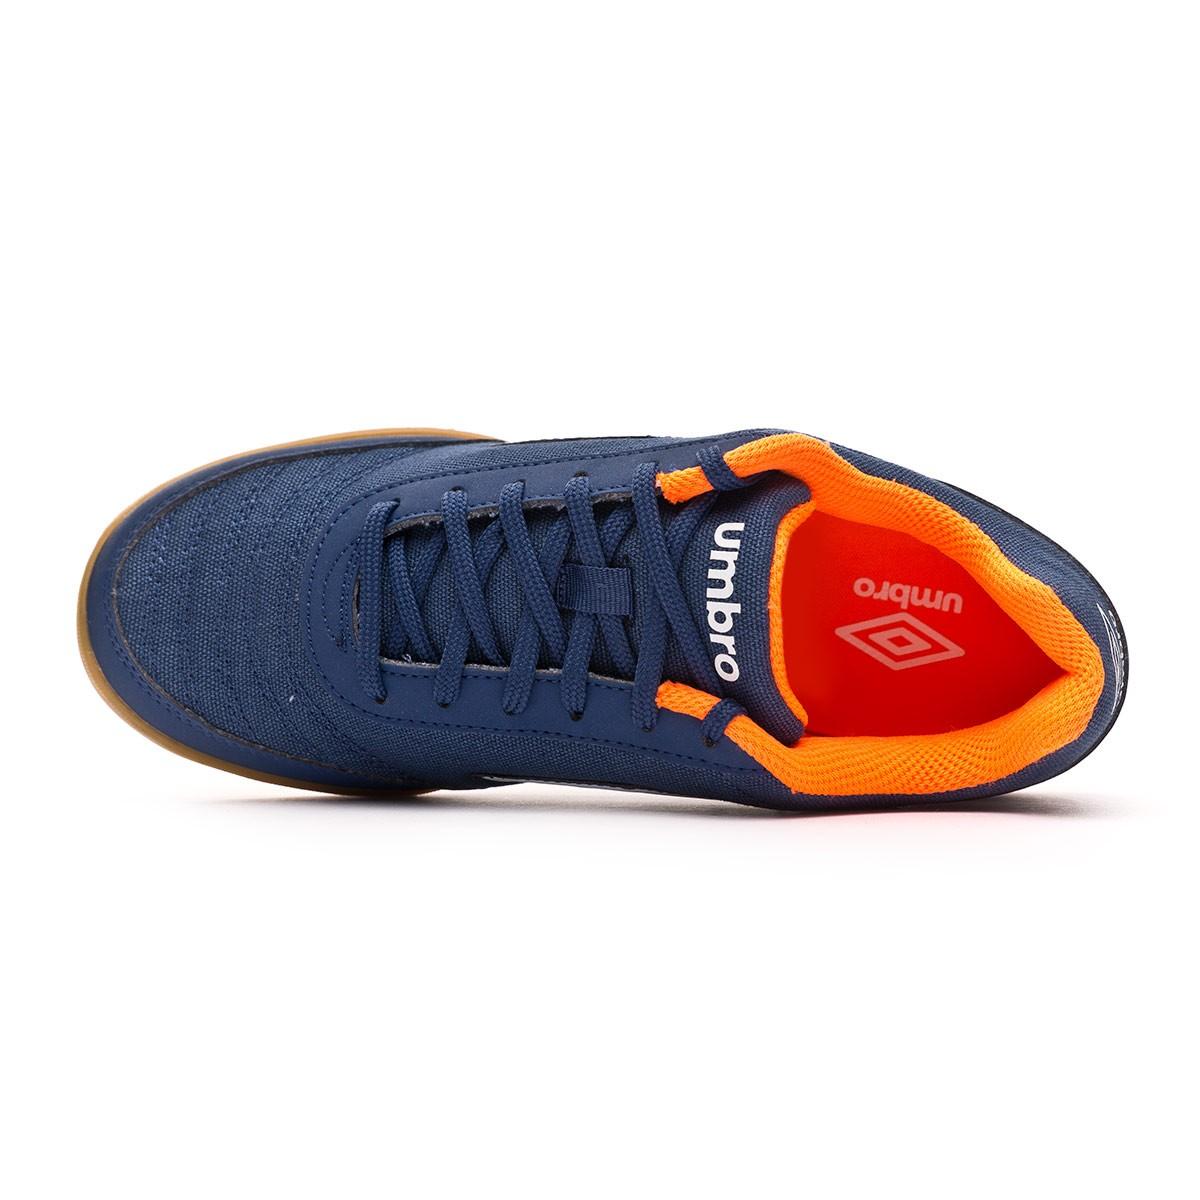 0b0a09b5743 Futsal Boot Umbro Futsal Street V IC Navy - Football store Fútbol Emotion